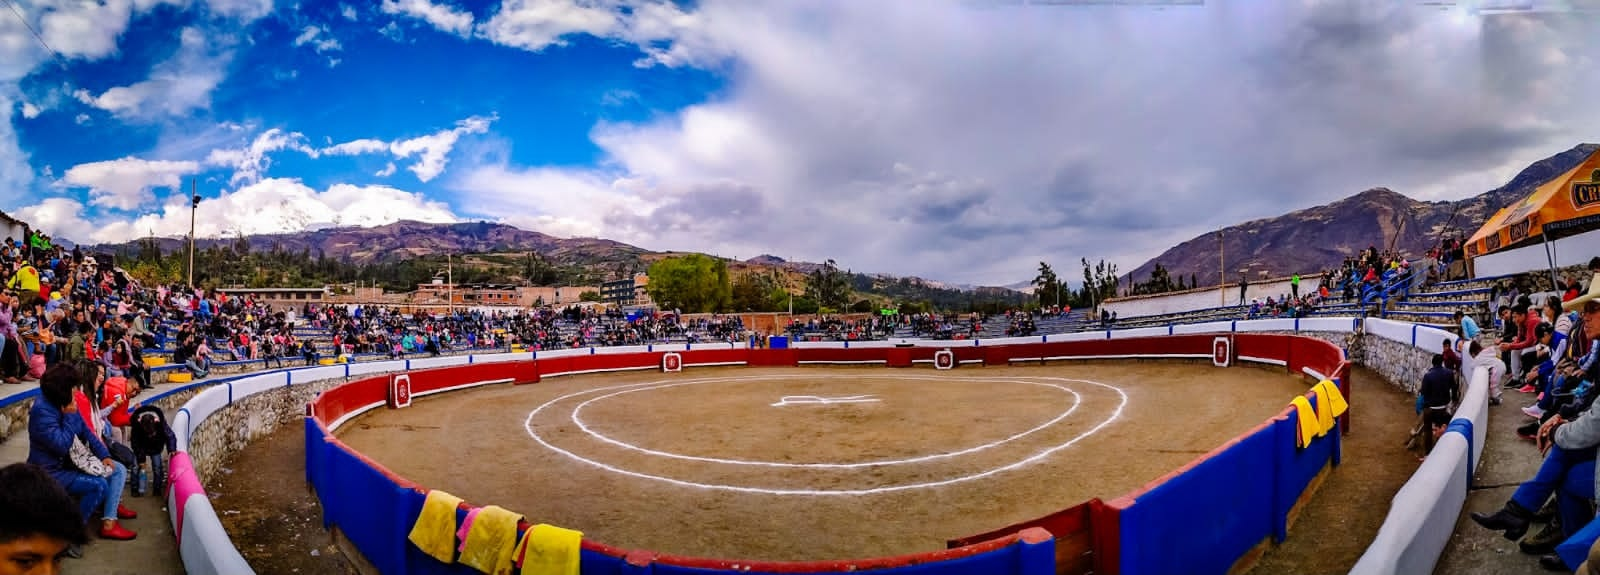 Plaza de toros de Ranrahirca - Yungay - Ancash